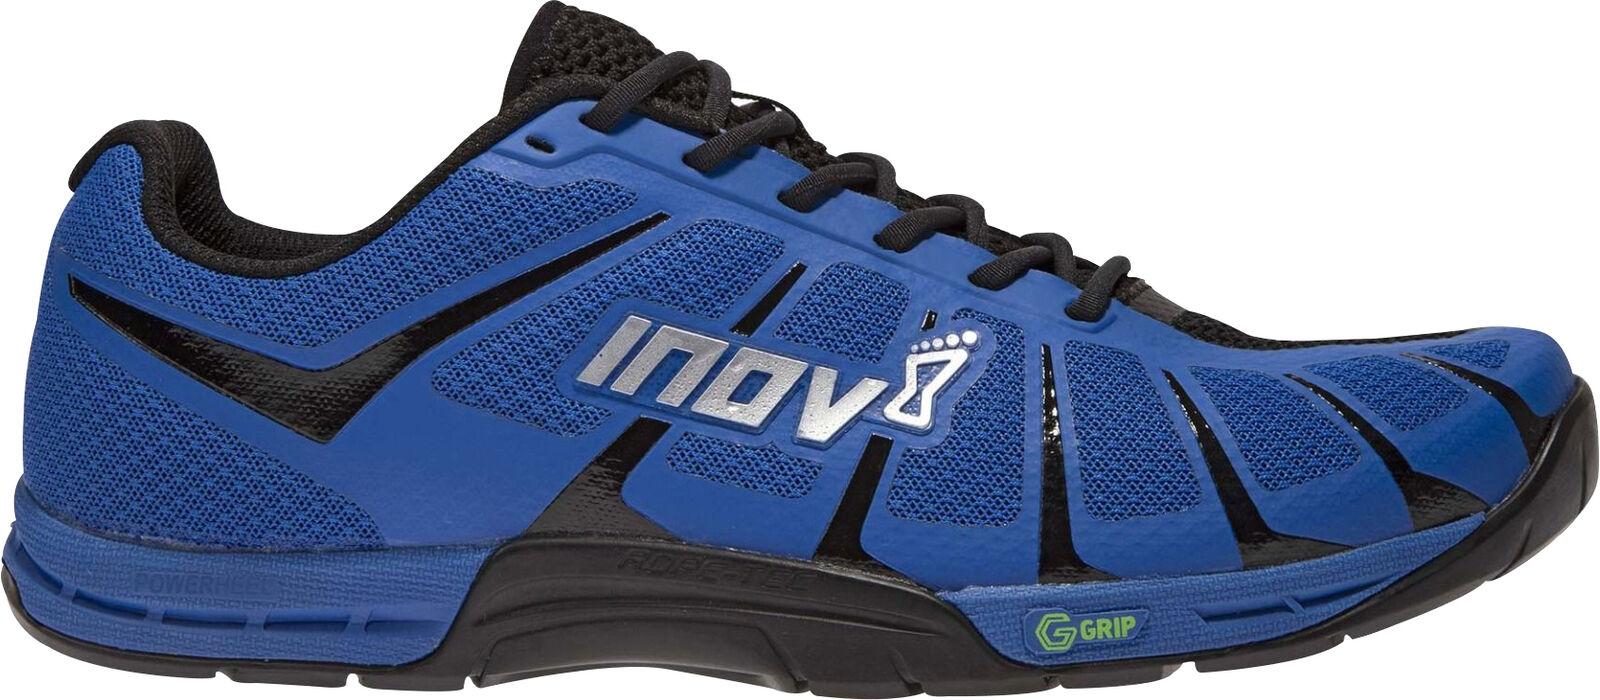 Inov8 F-Lite 235 V3 Pour des hommes Training chaussures - bleu